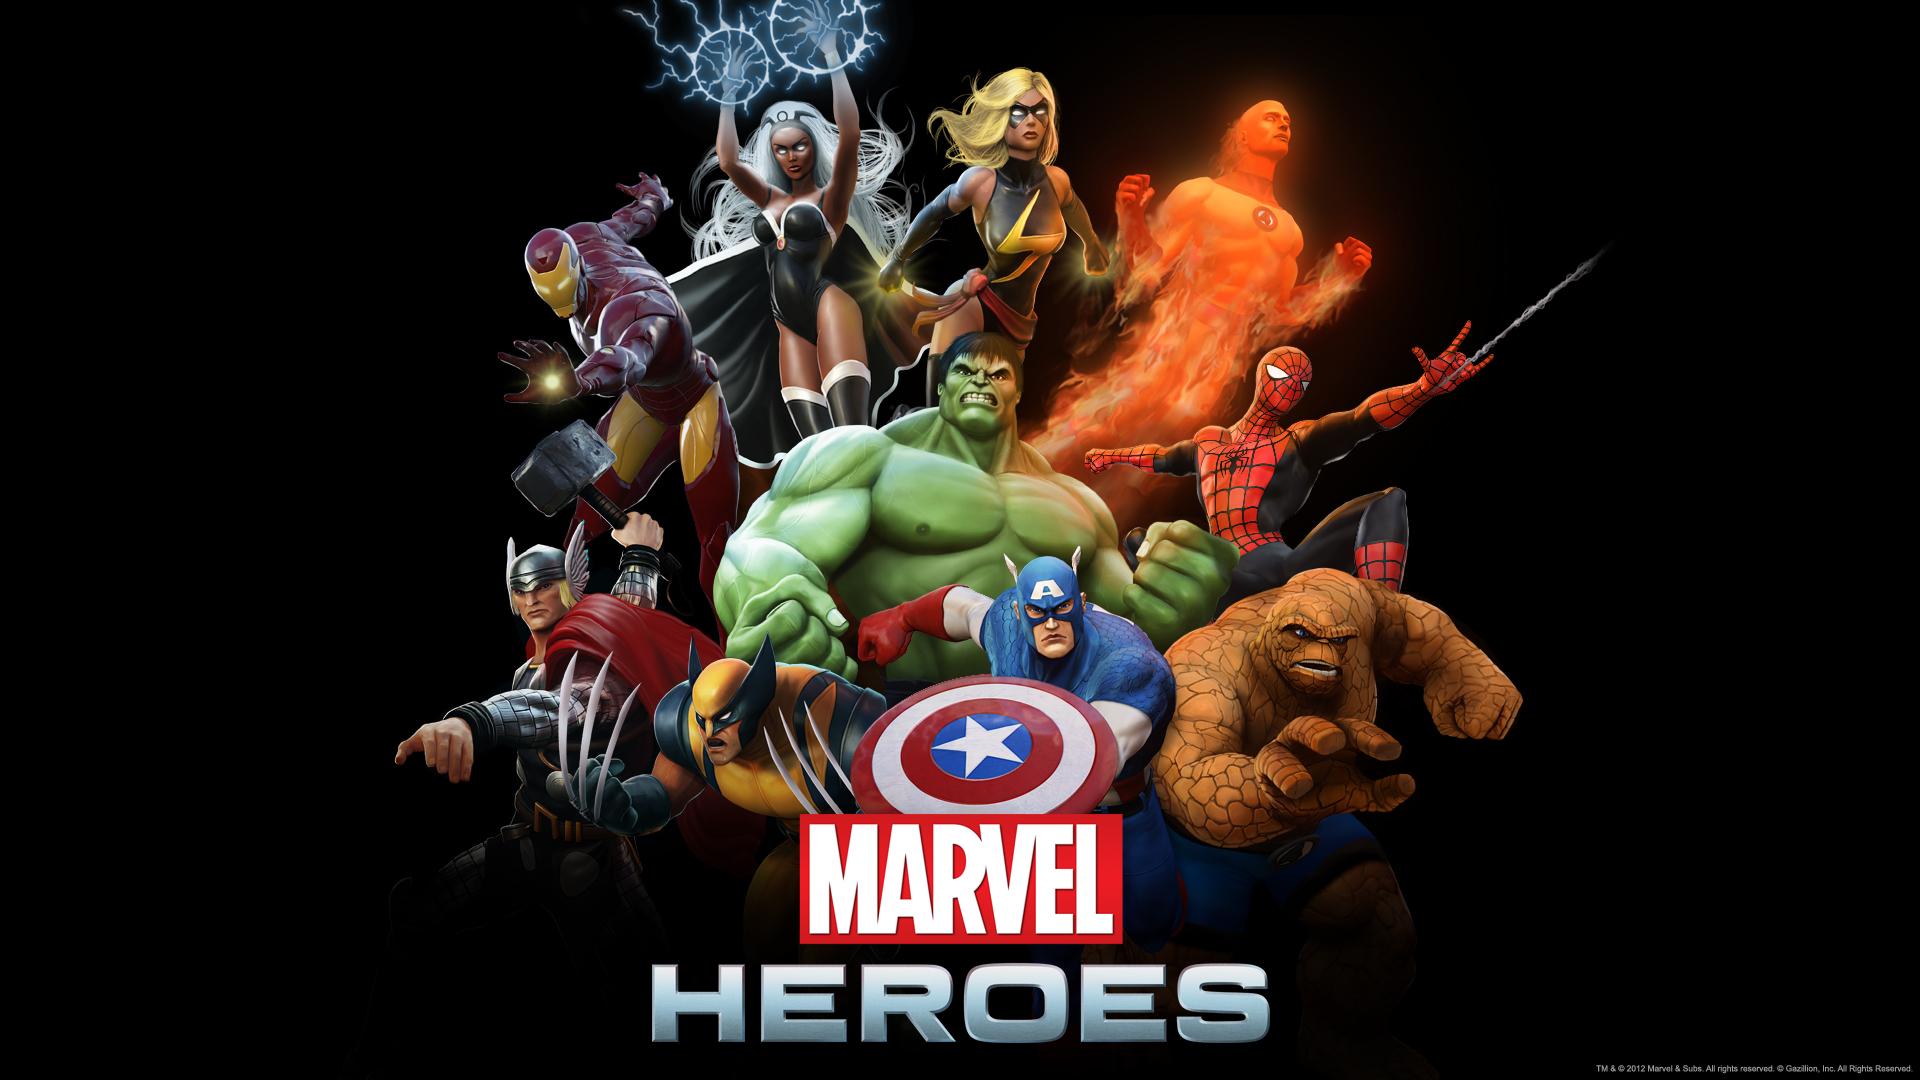 Pics Photos   Marvel Heroes 2013 Game Wallpaper Hd 1920x1080